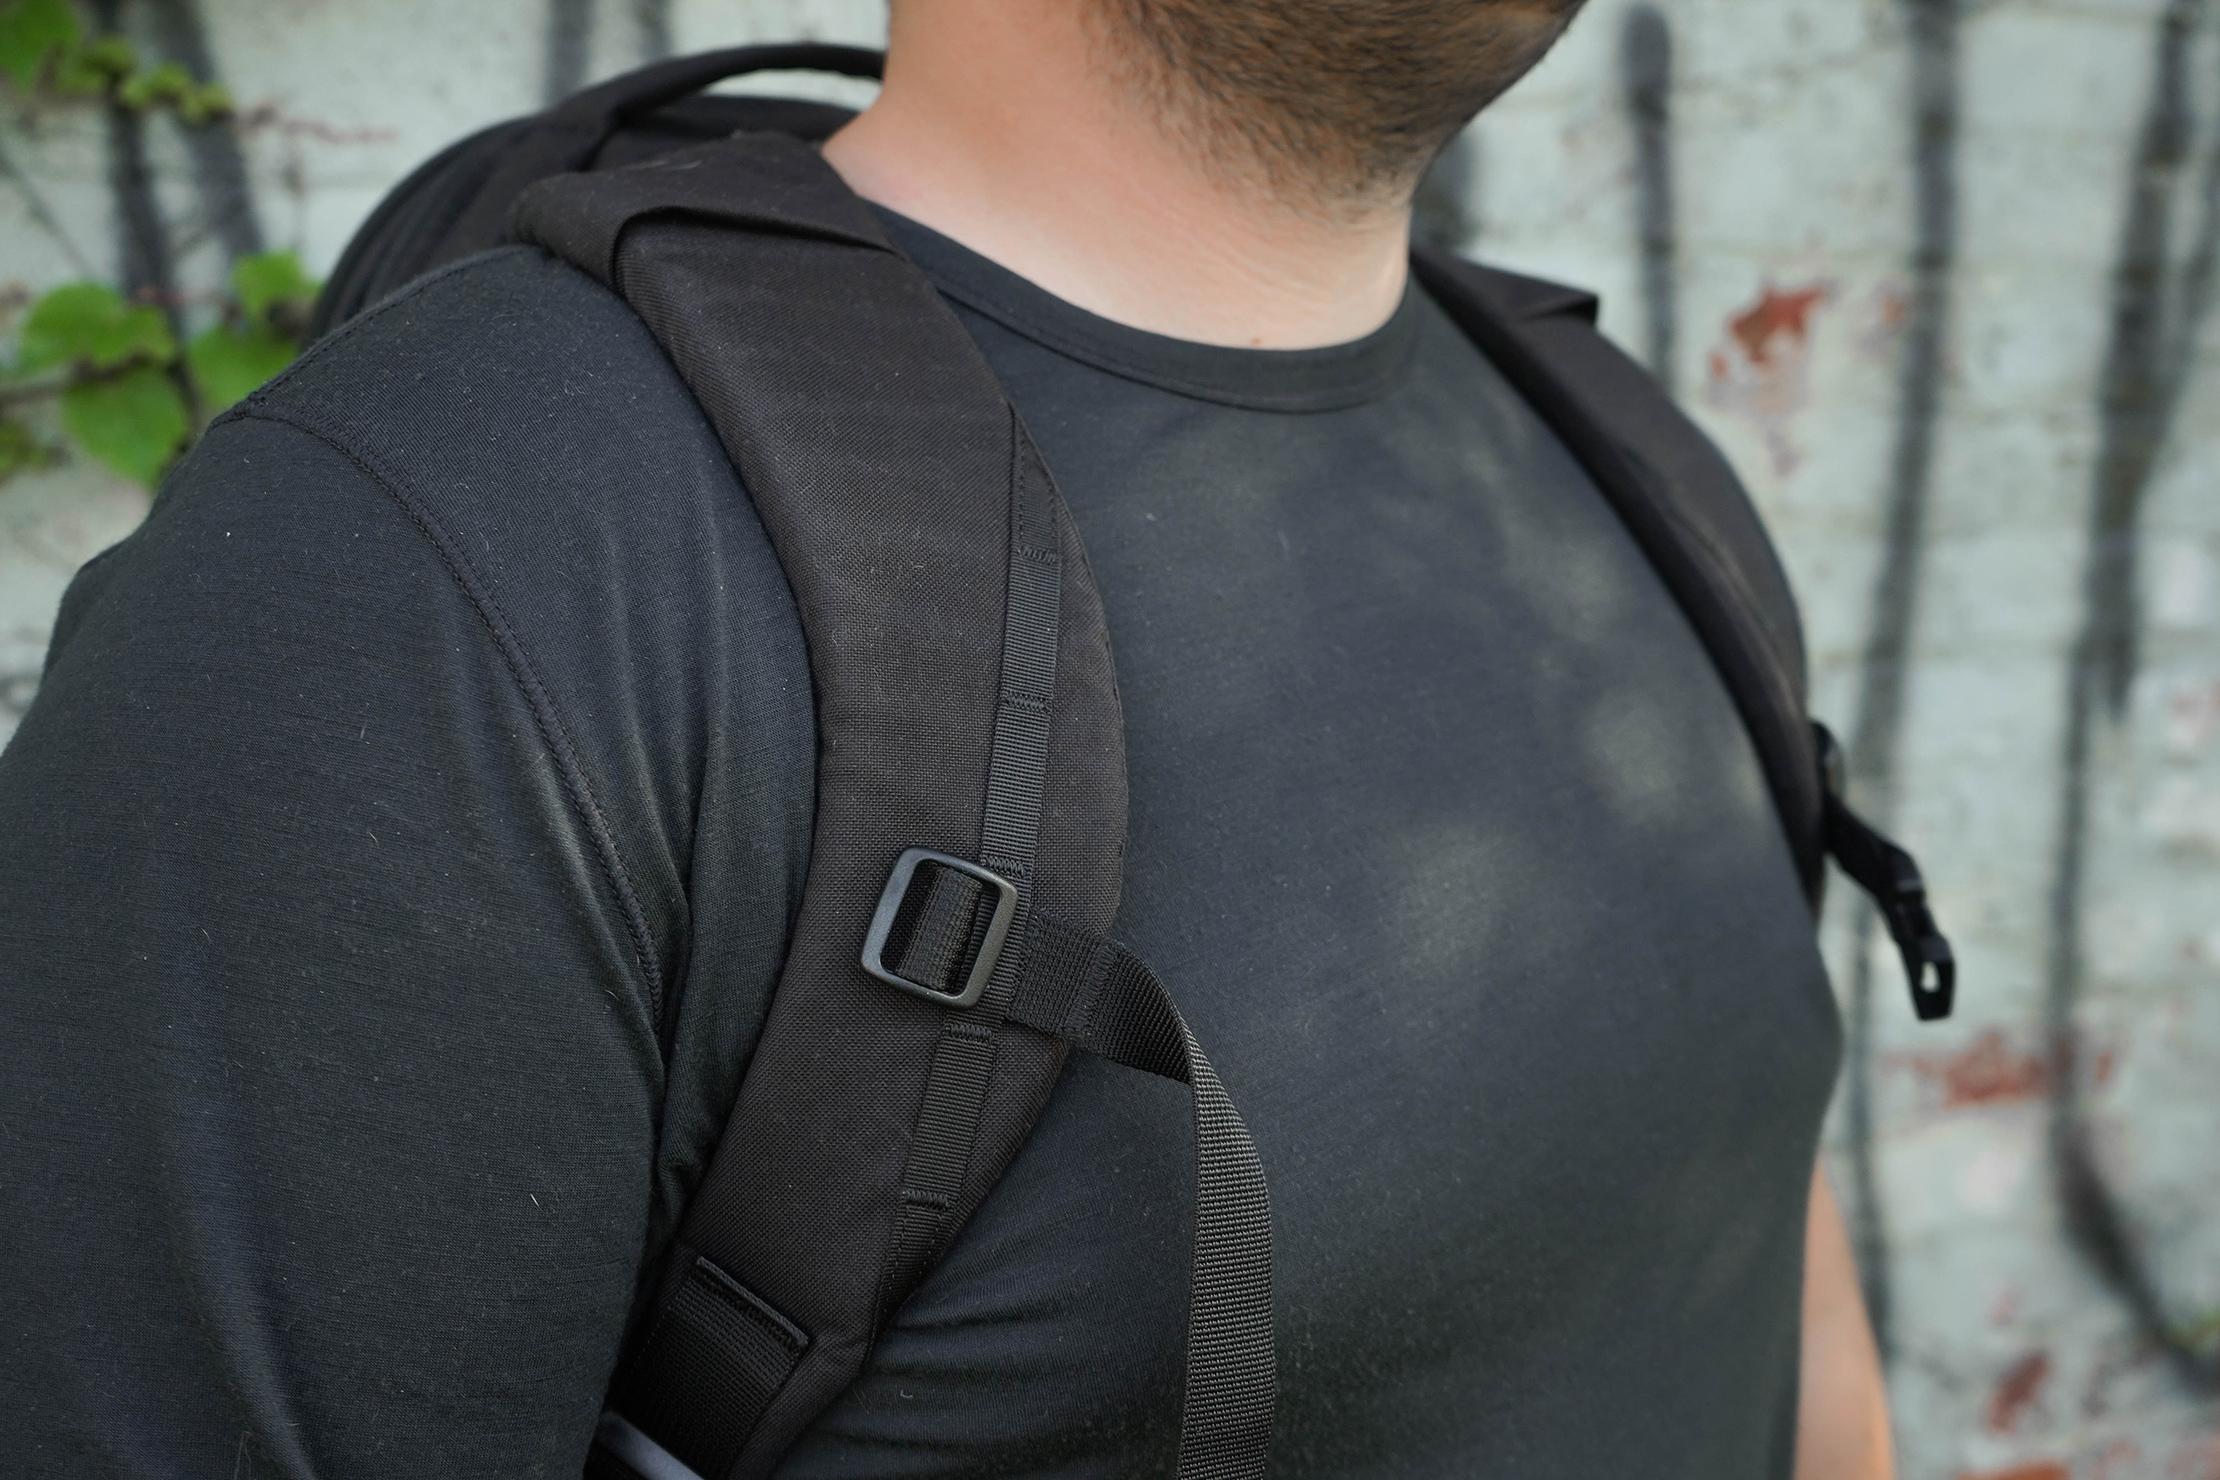 EVERGOODS Civic Half Zip 22 Curved Shoulder Straps